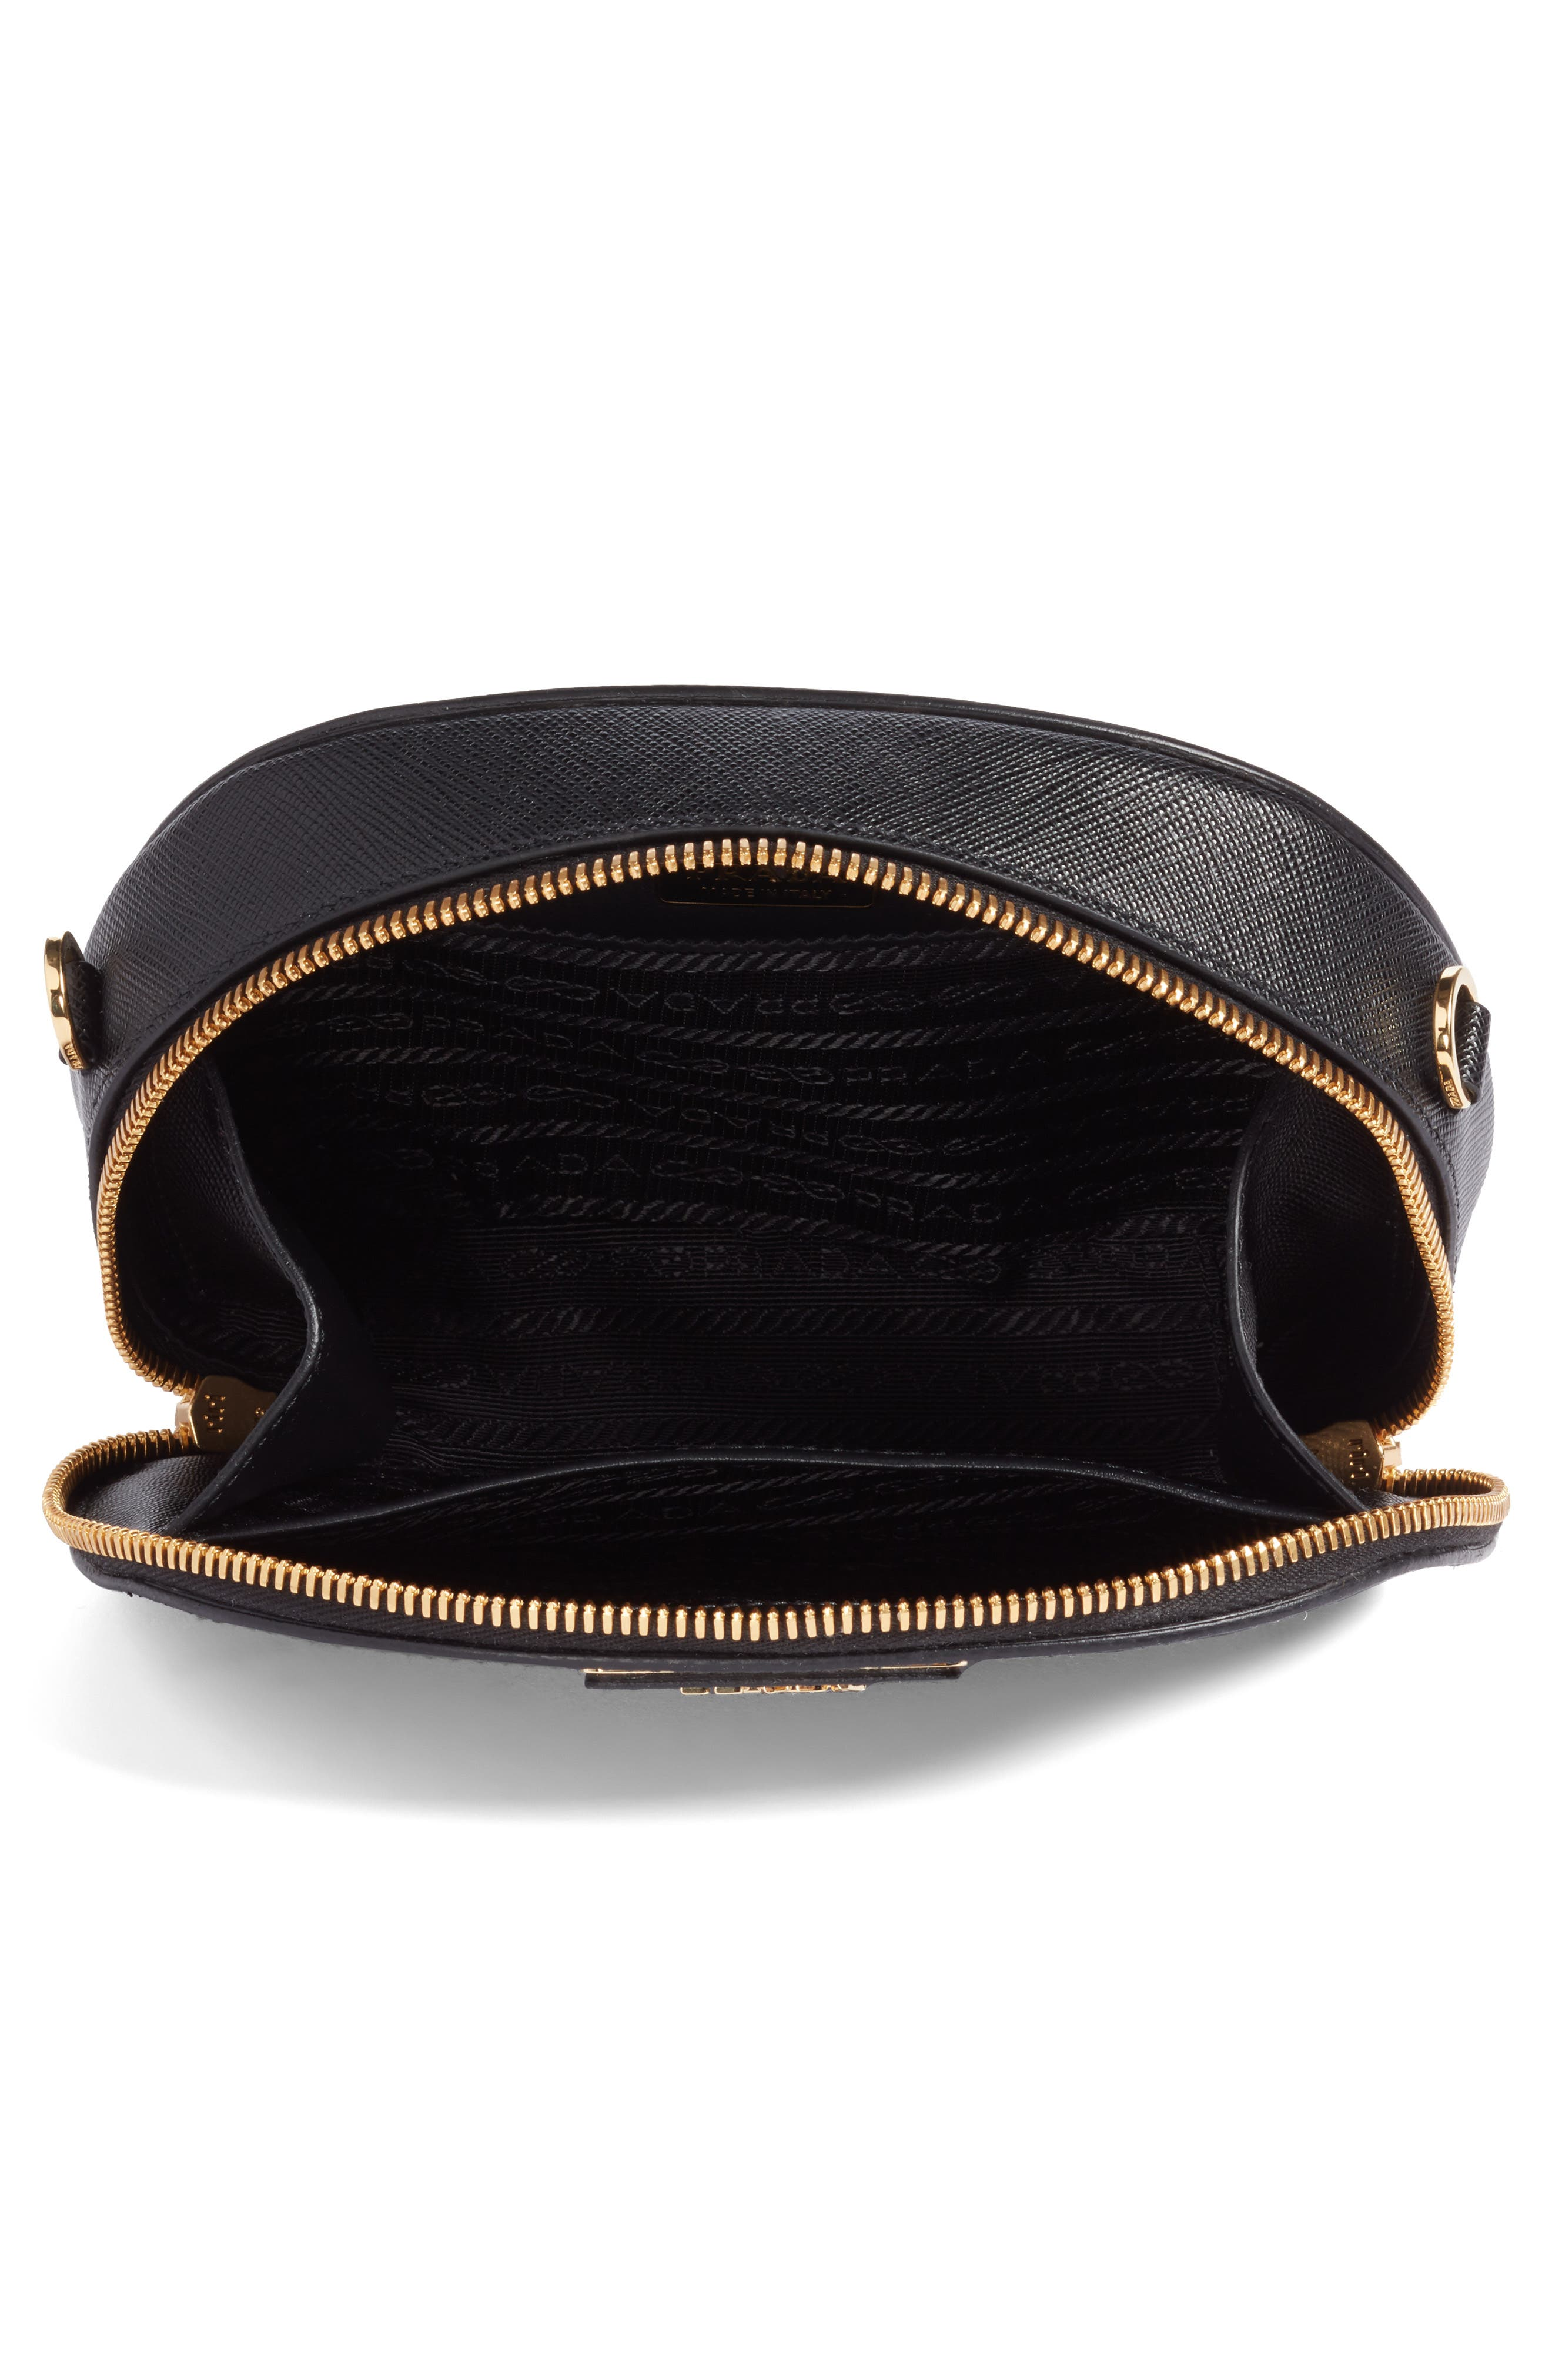 PRADA, Saffiano Leather Belt Bag, Alternate thumbnail 5, color, 001